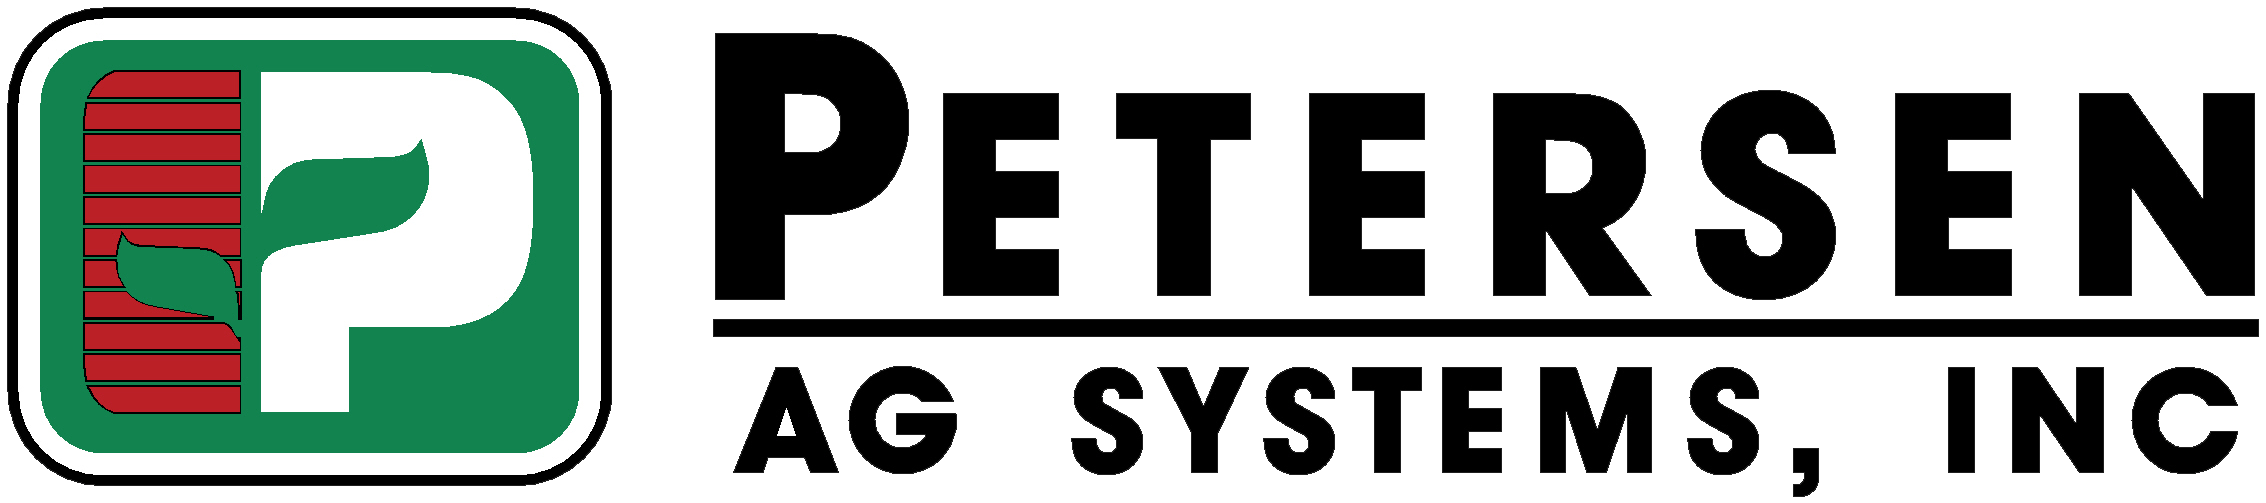 Petersen Ag Systems Logo